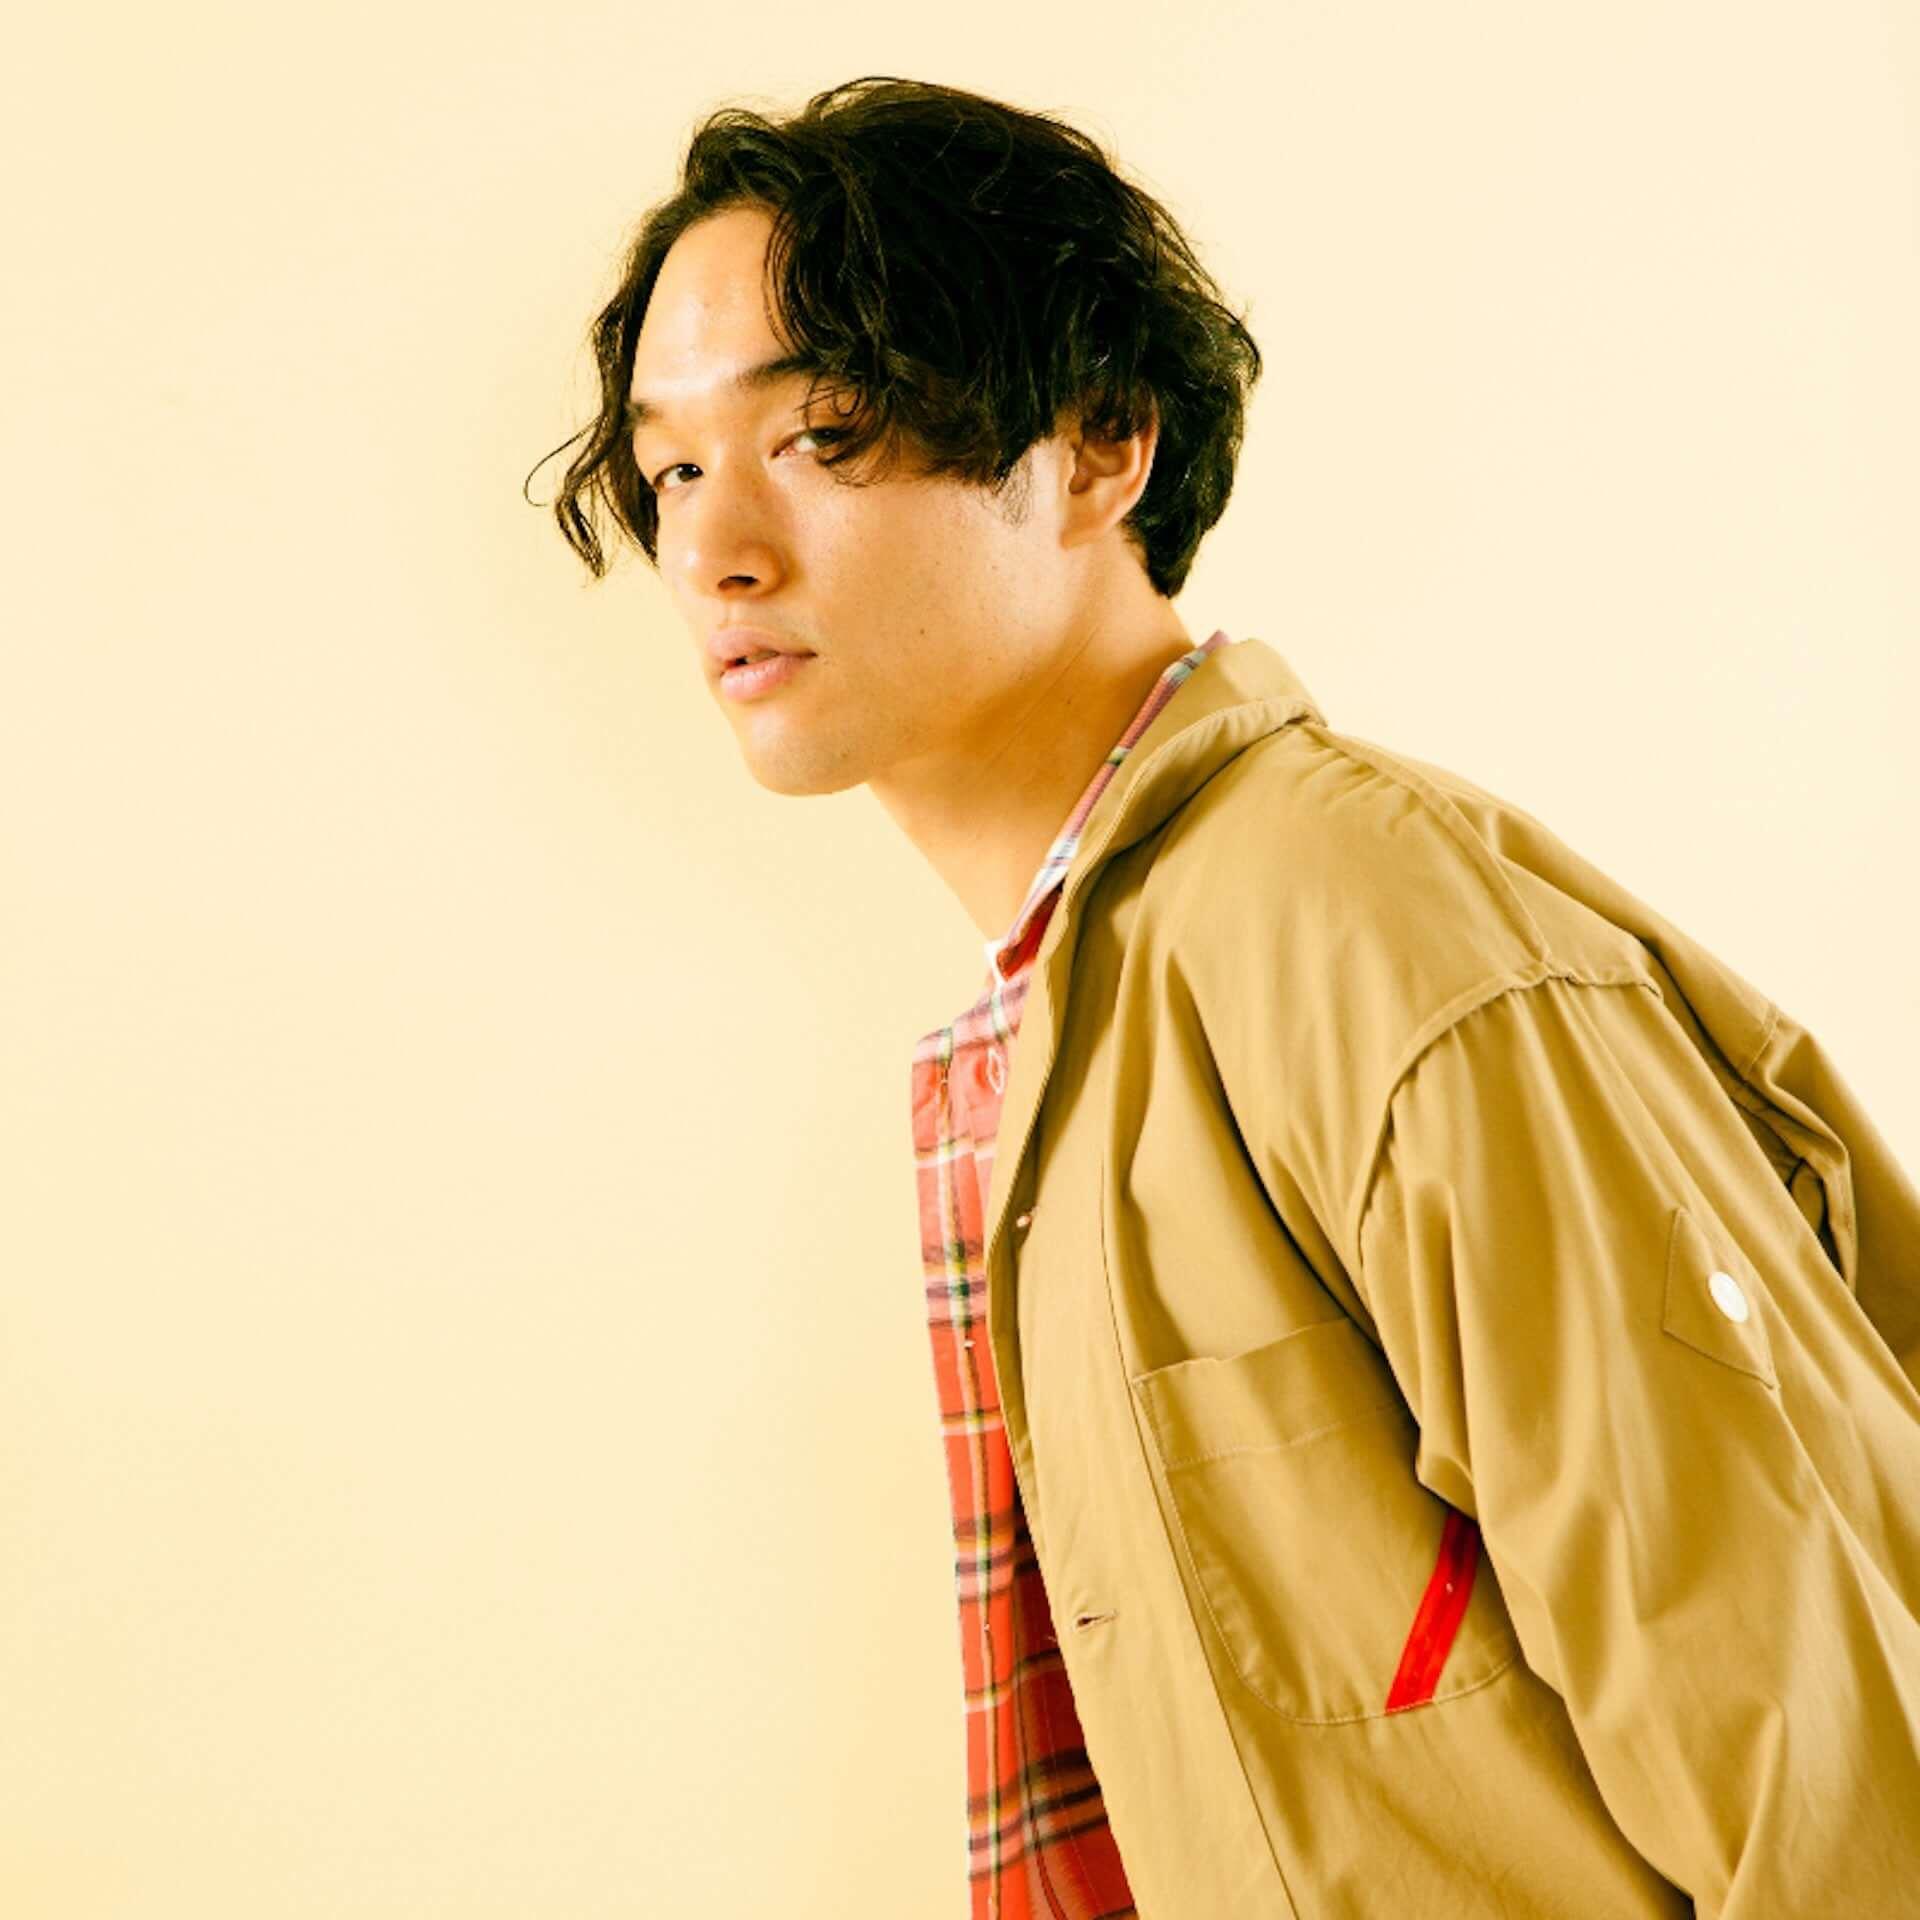 Pioneer DJ『CDJ-3000』のローンチパーティーが渋谷Contactにて明日開催!DJ Nobu、Gonno、SEKITOVA、okadadaらが出演 music201029_contact-cdj3000_11-1920x1920